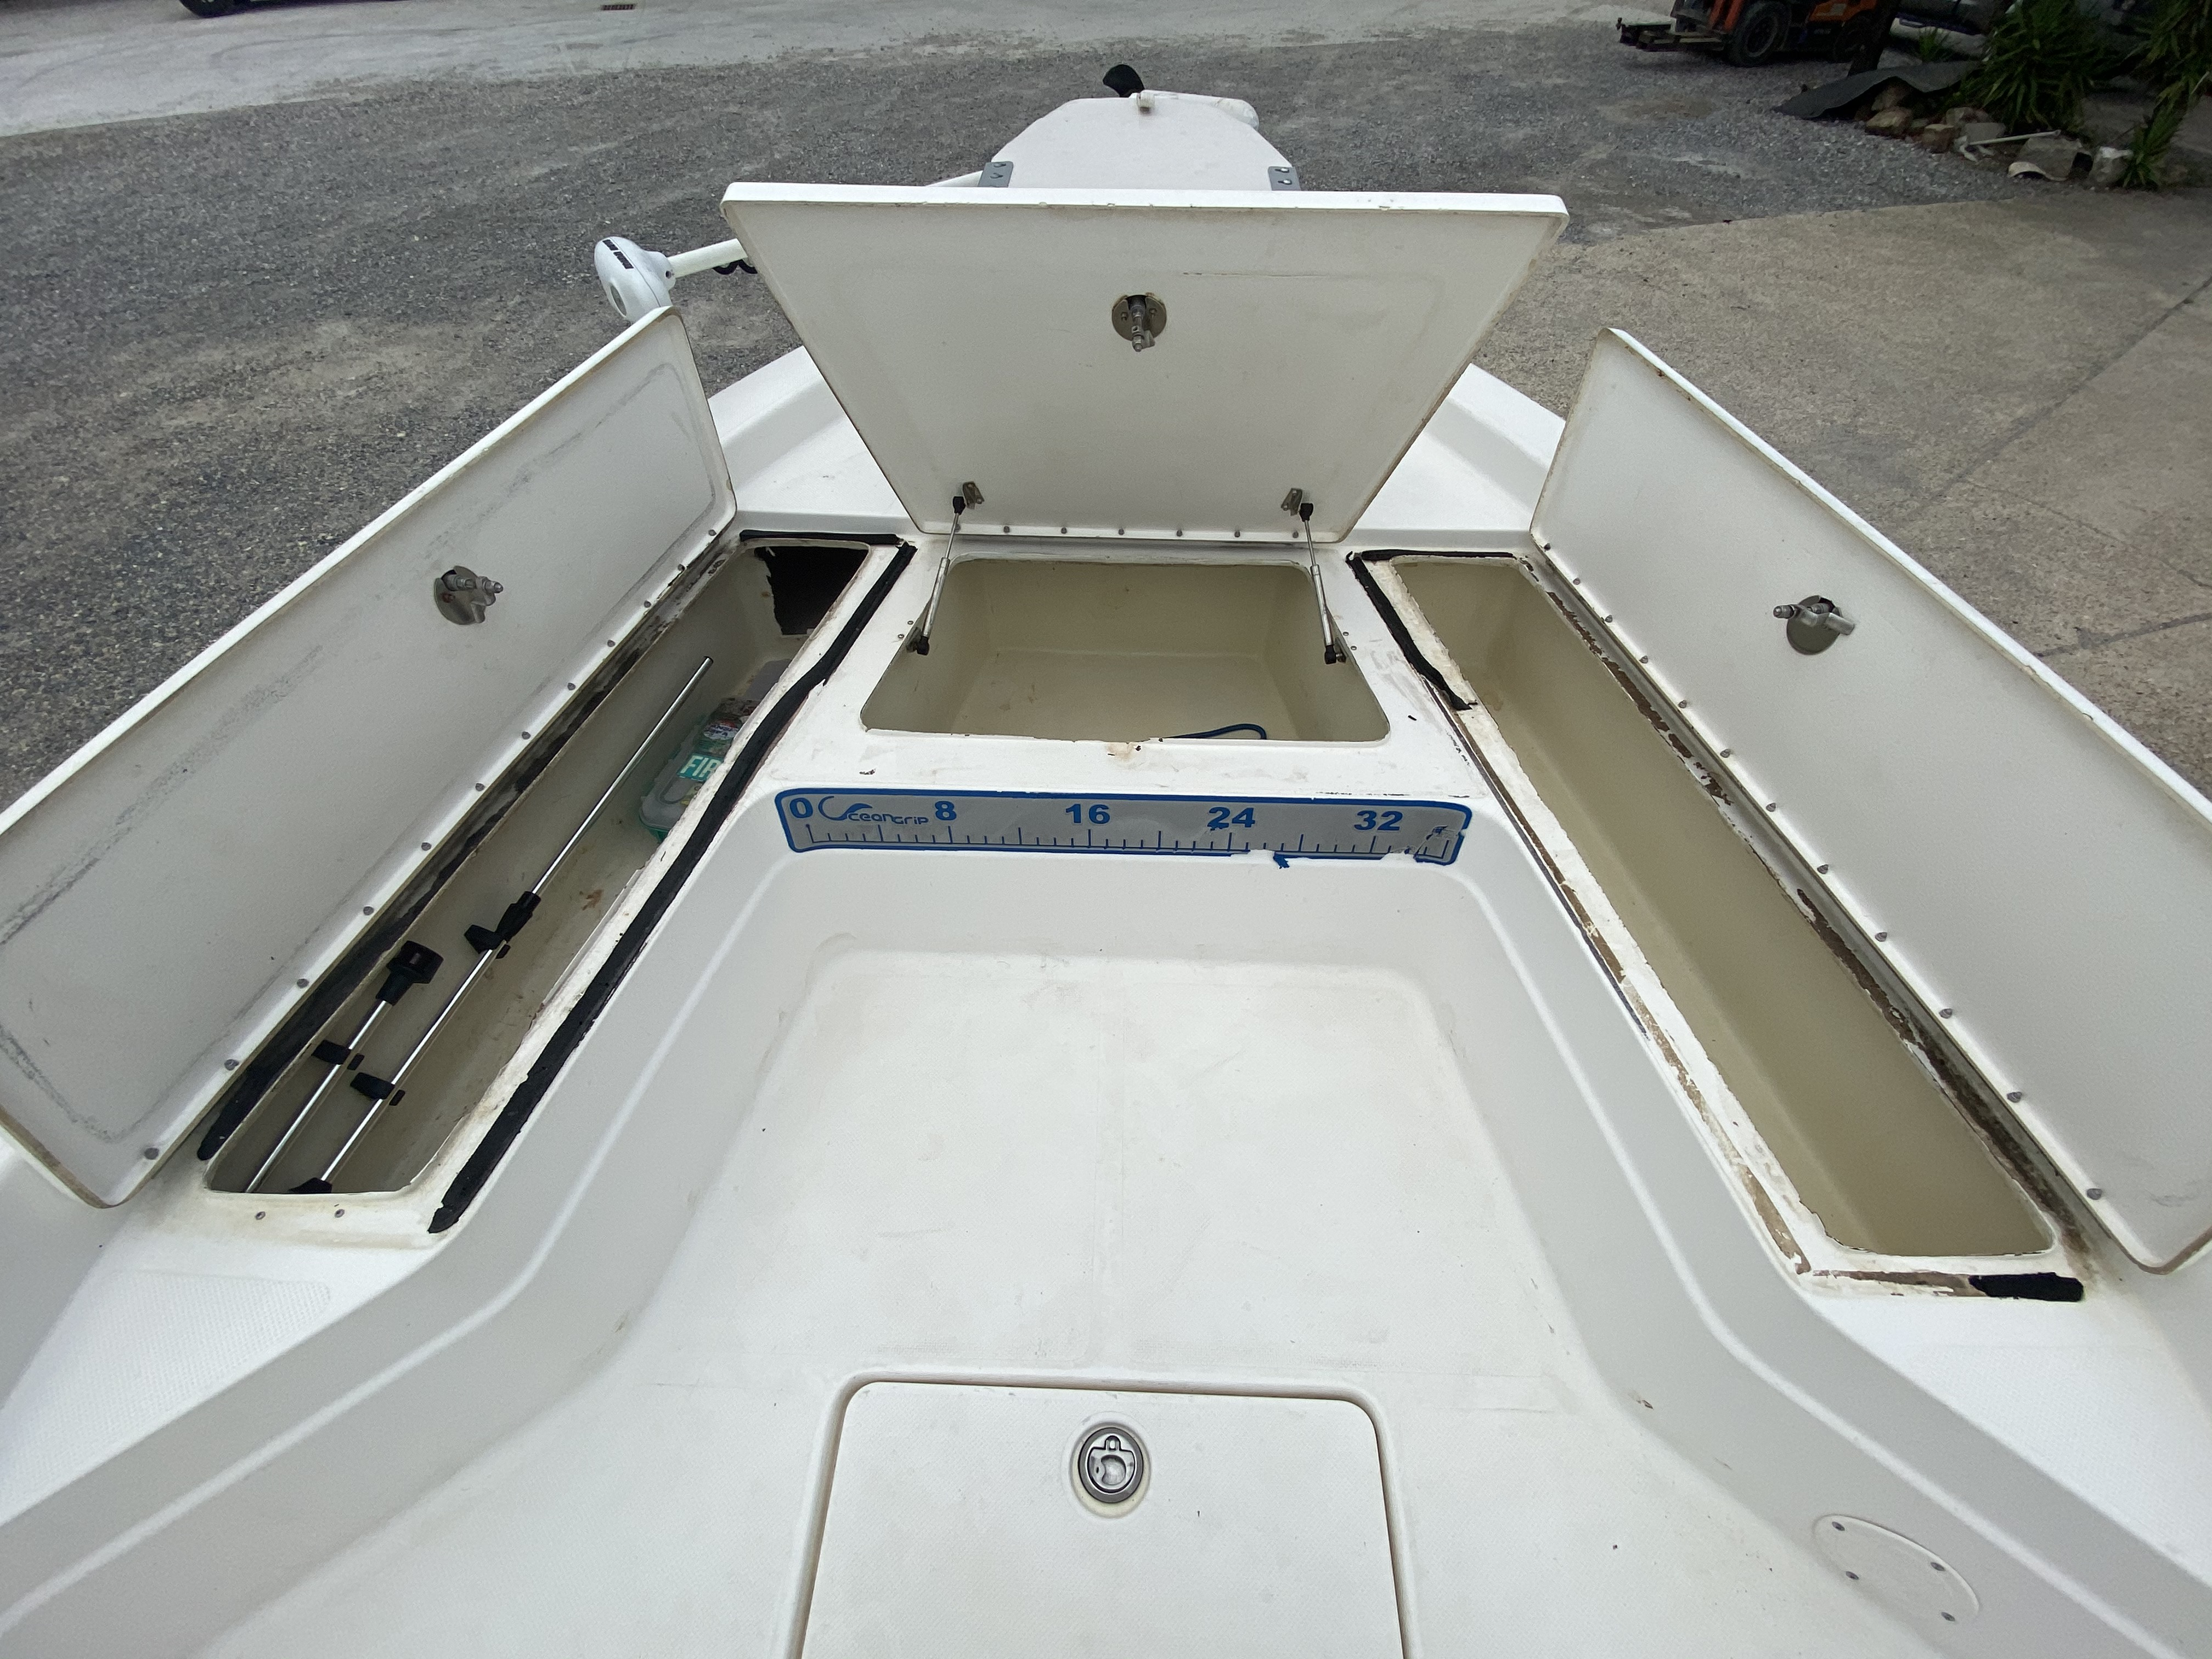 2010 Skeeter boat for sale, model of the boat is ZX 24V & Image # 9 of 18